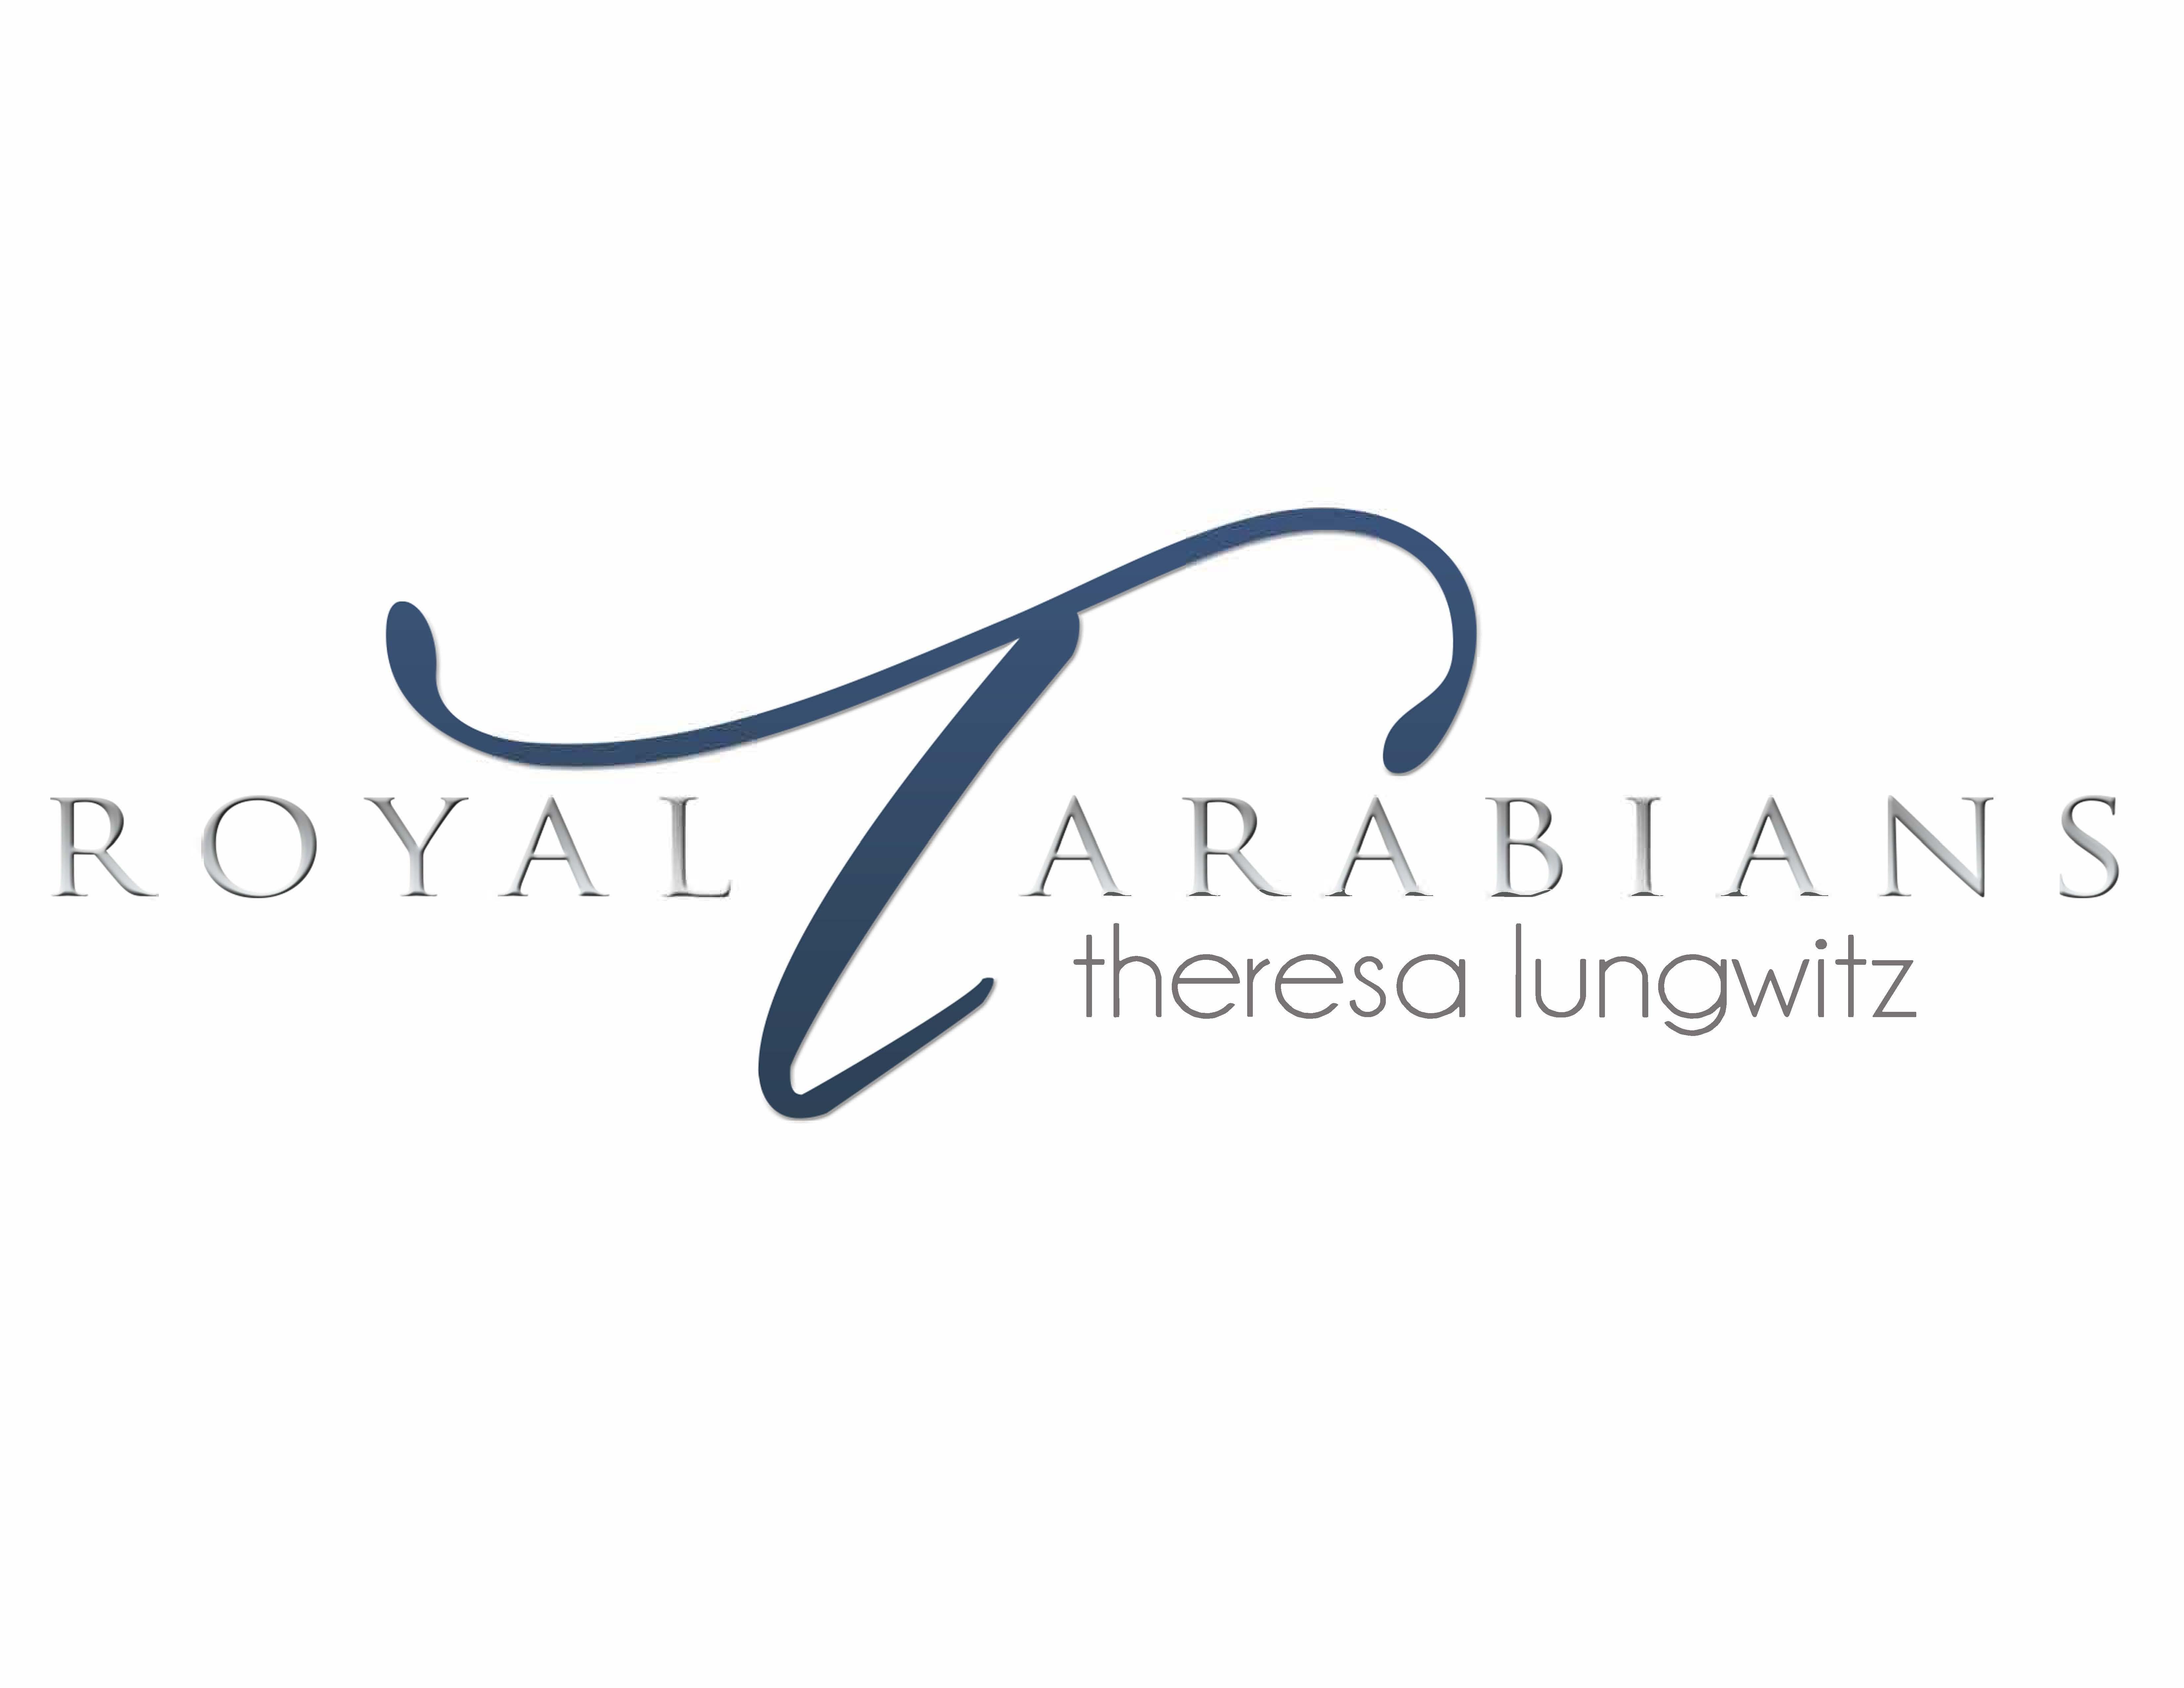 Royal T Arabians